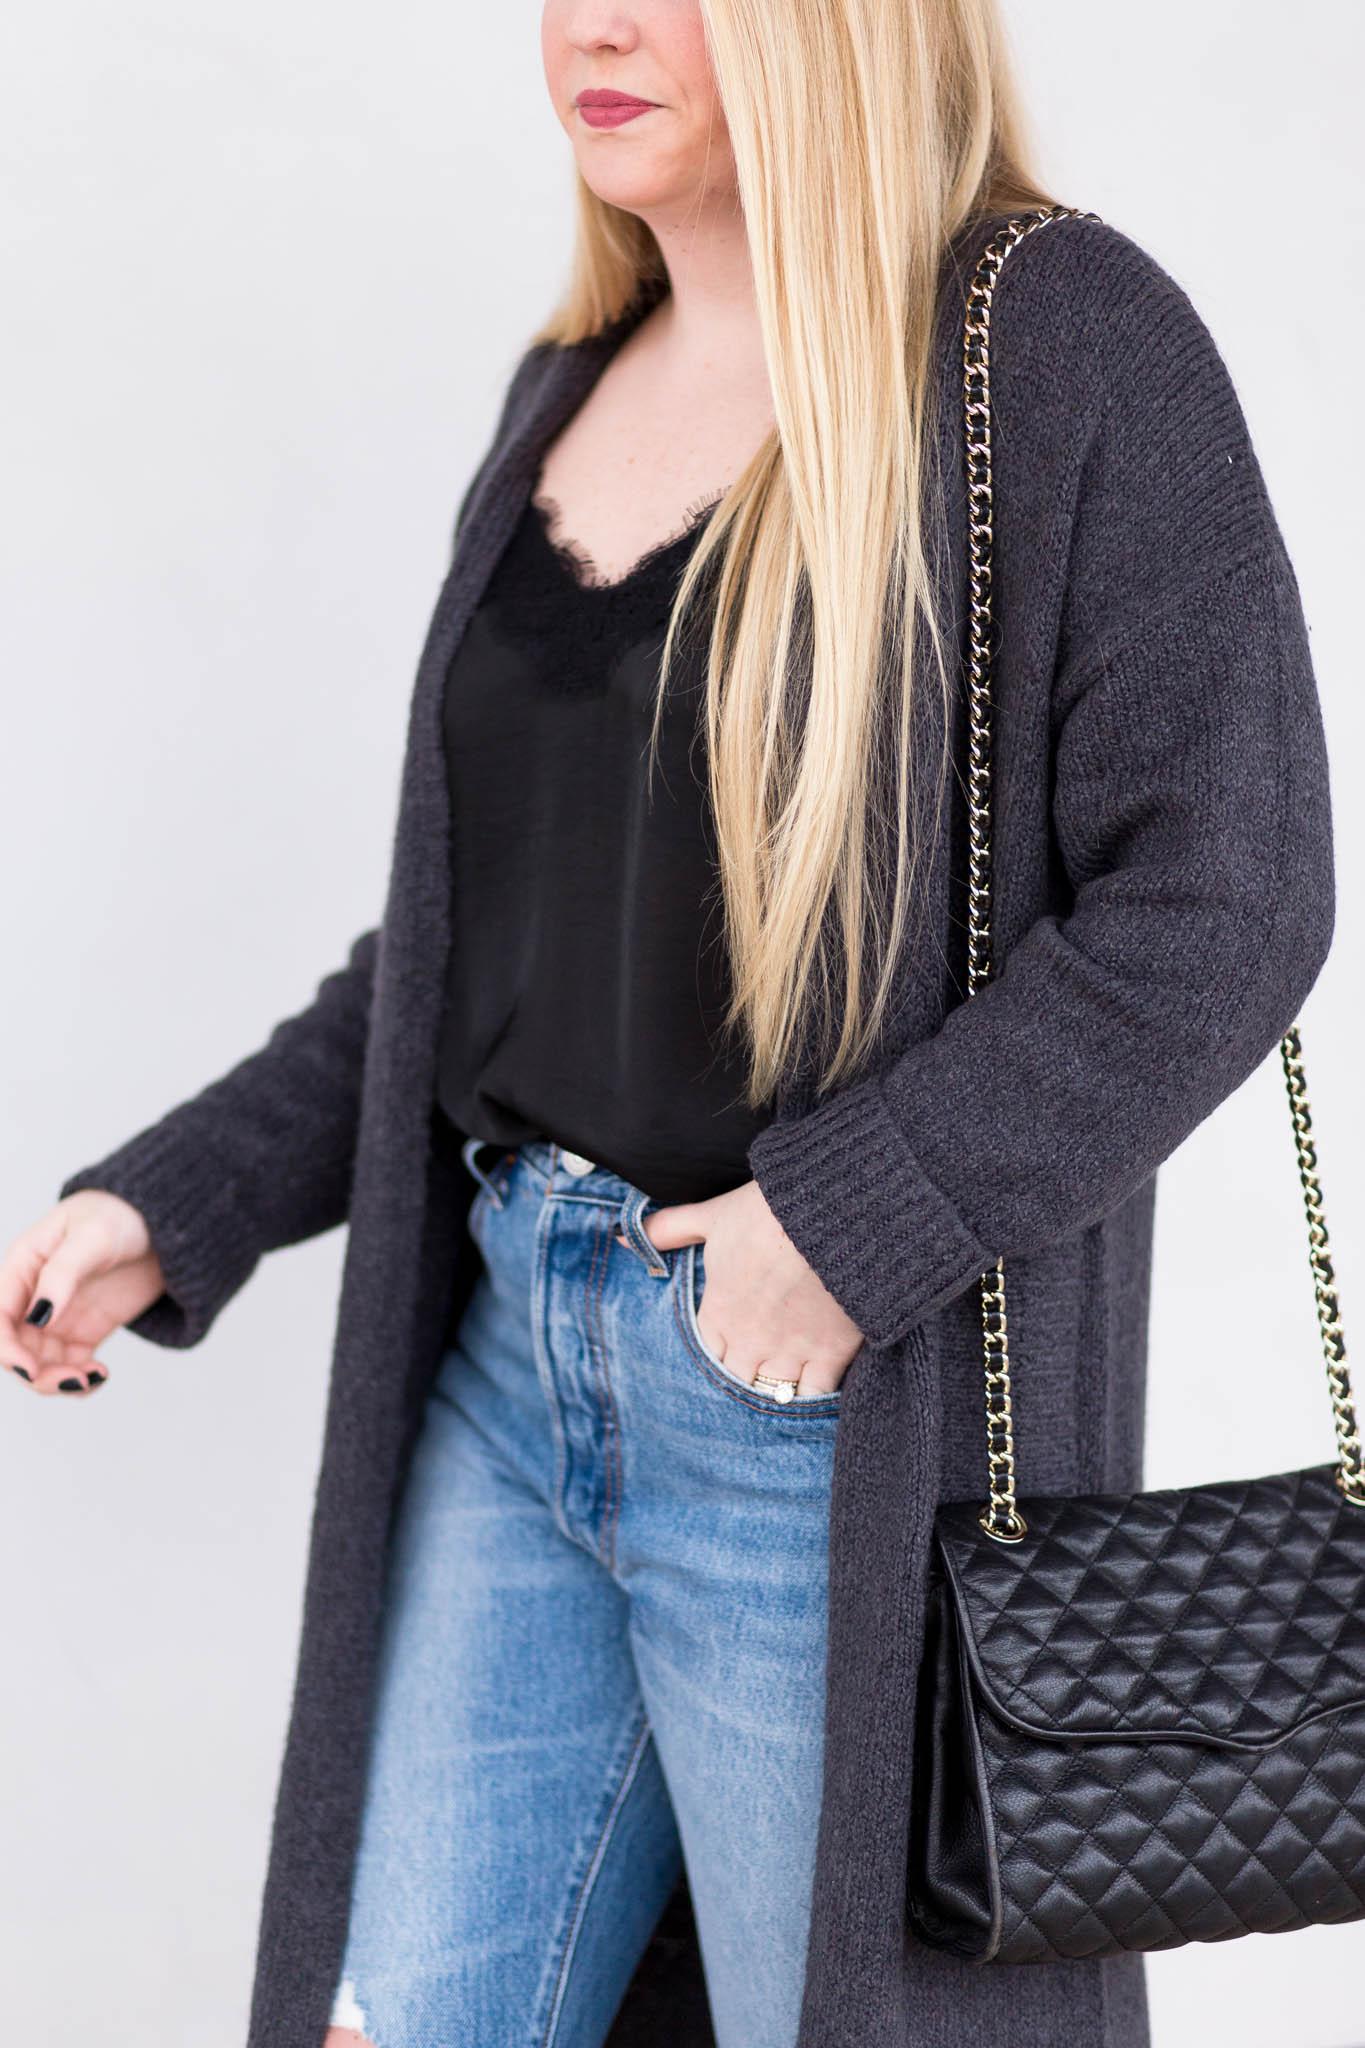 How to wear a longline cardigan